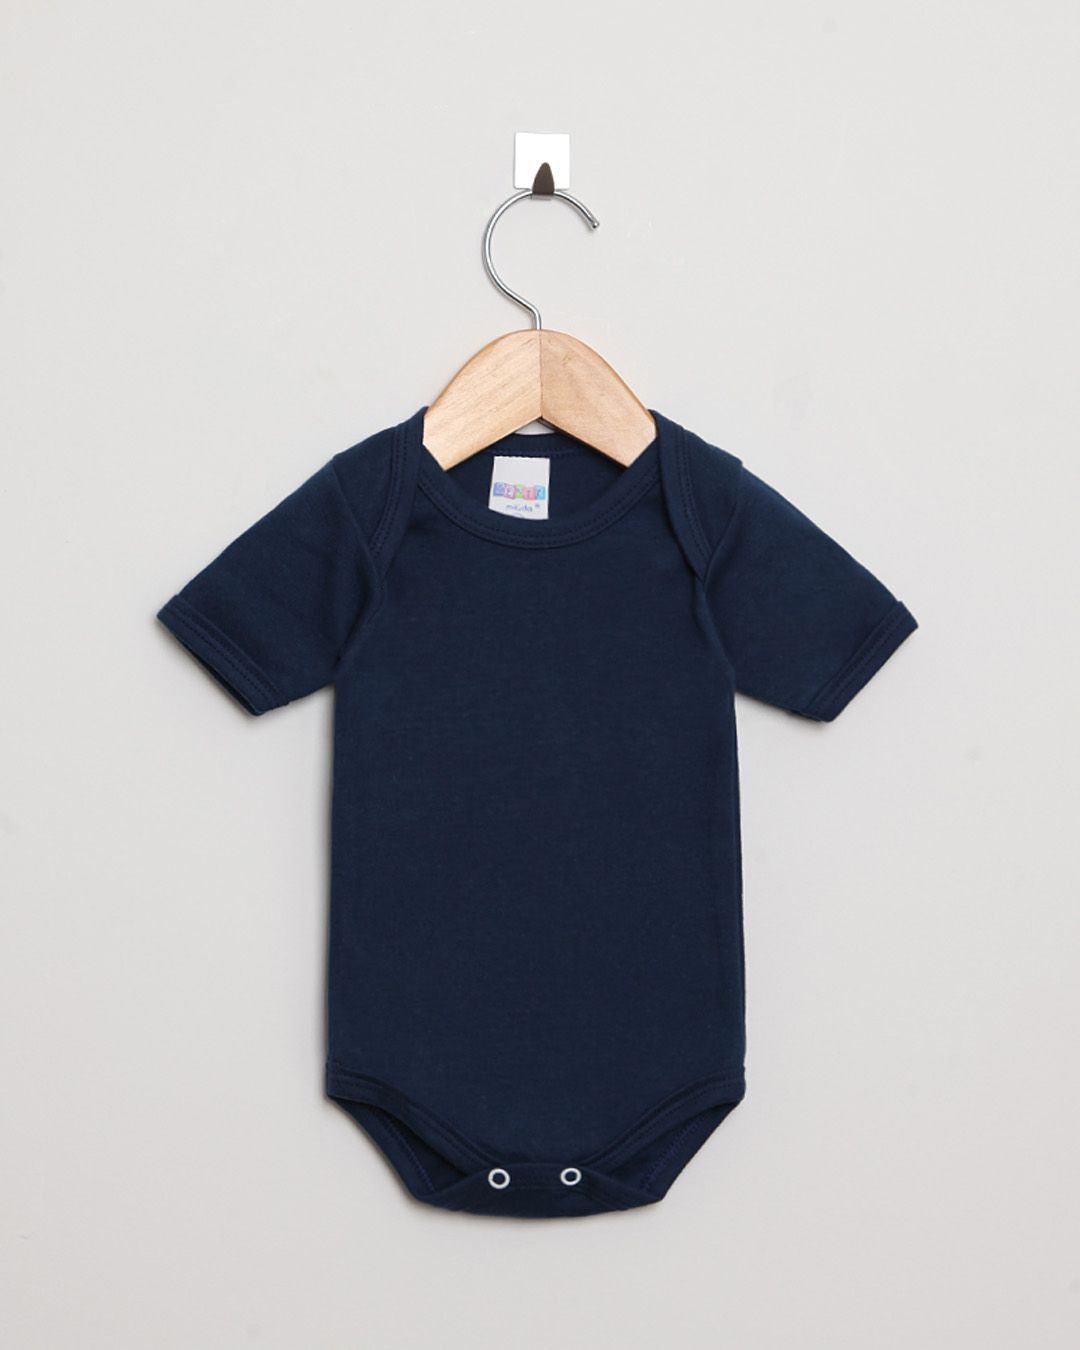 Body Bebê Manga Curta Suedine menino Azul Marinho Liso